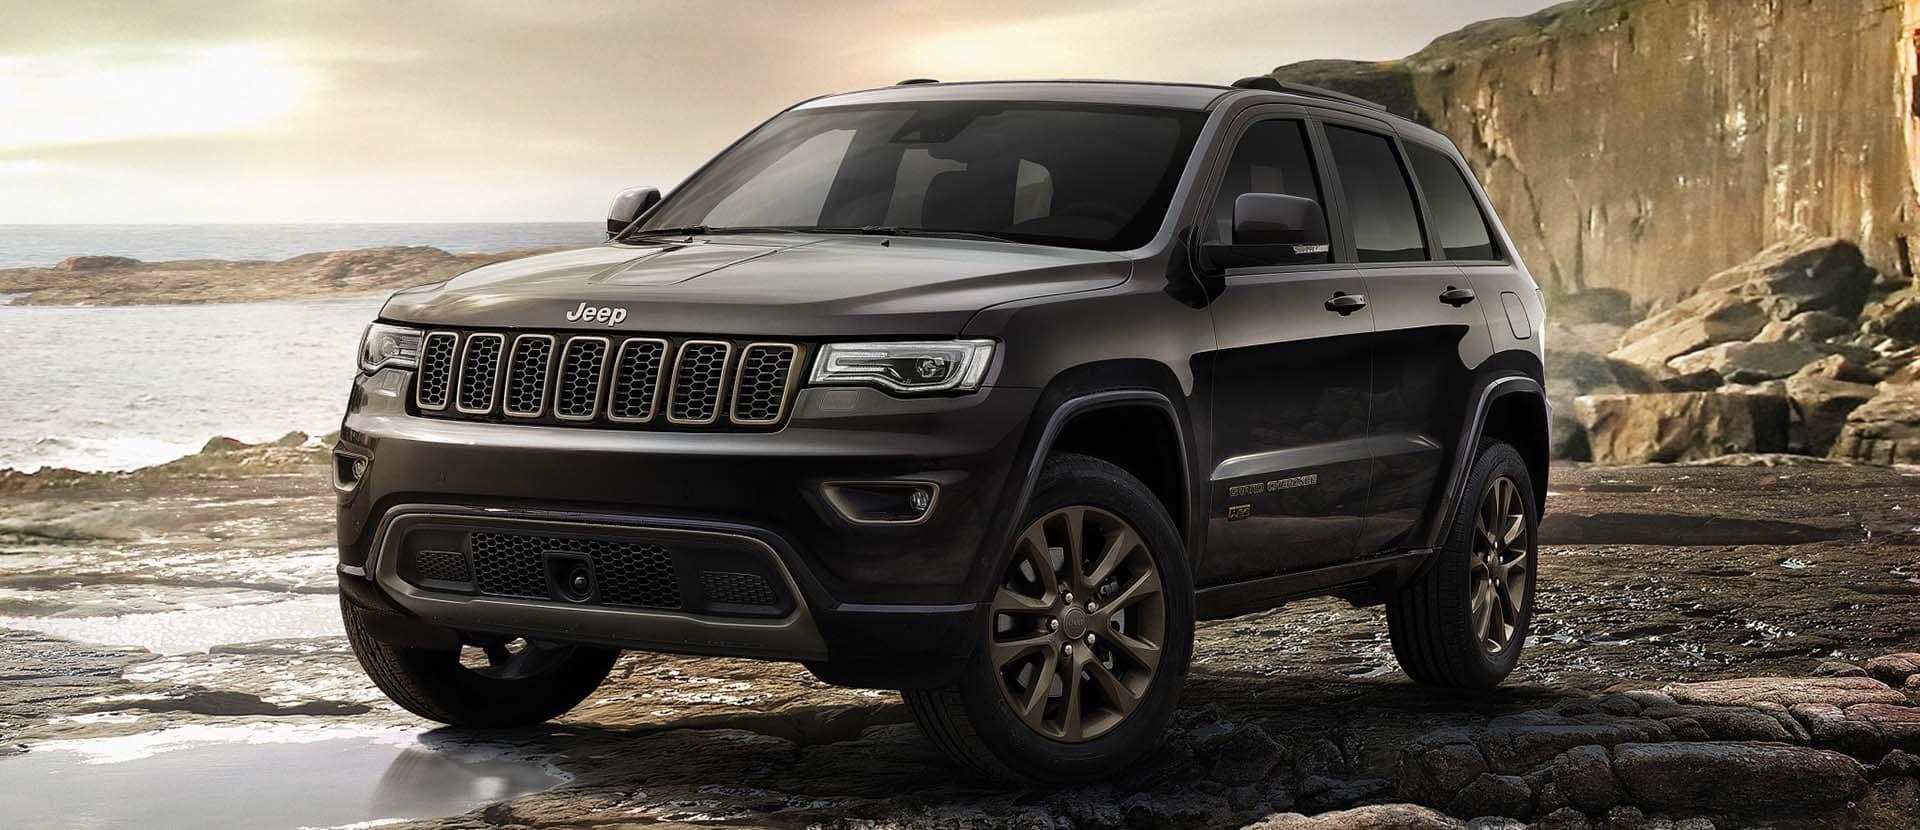 Jeep Dealership